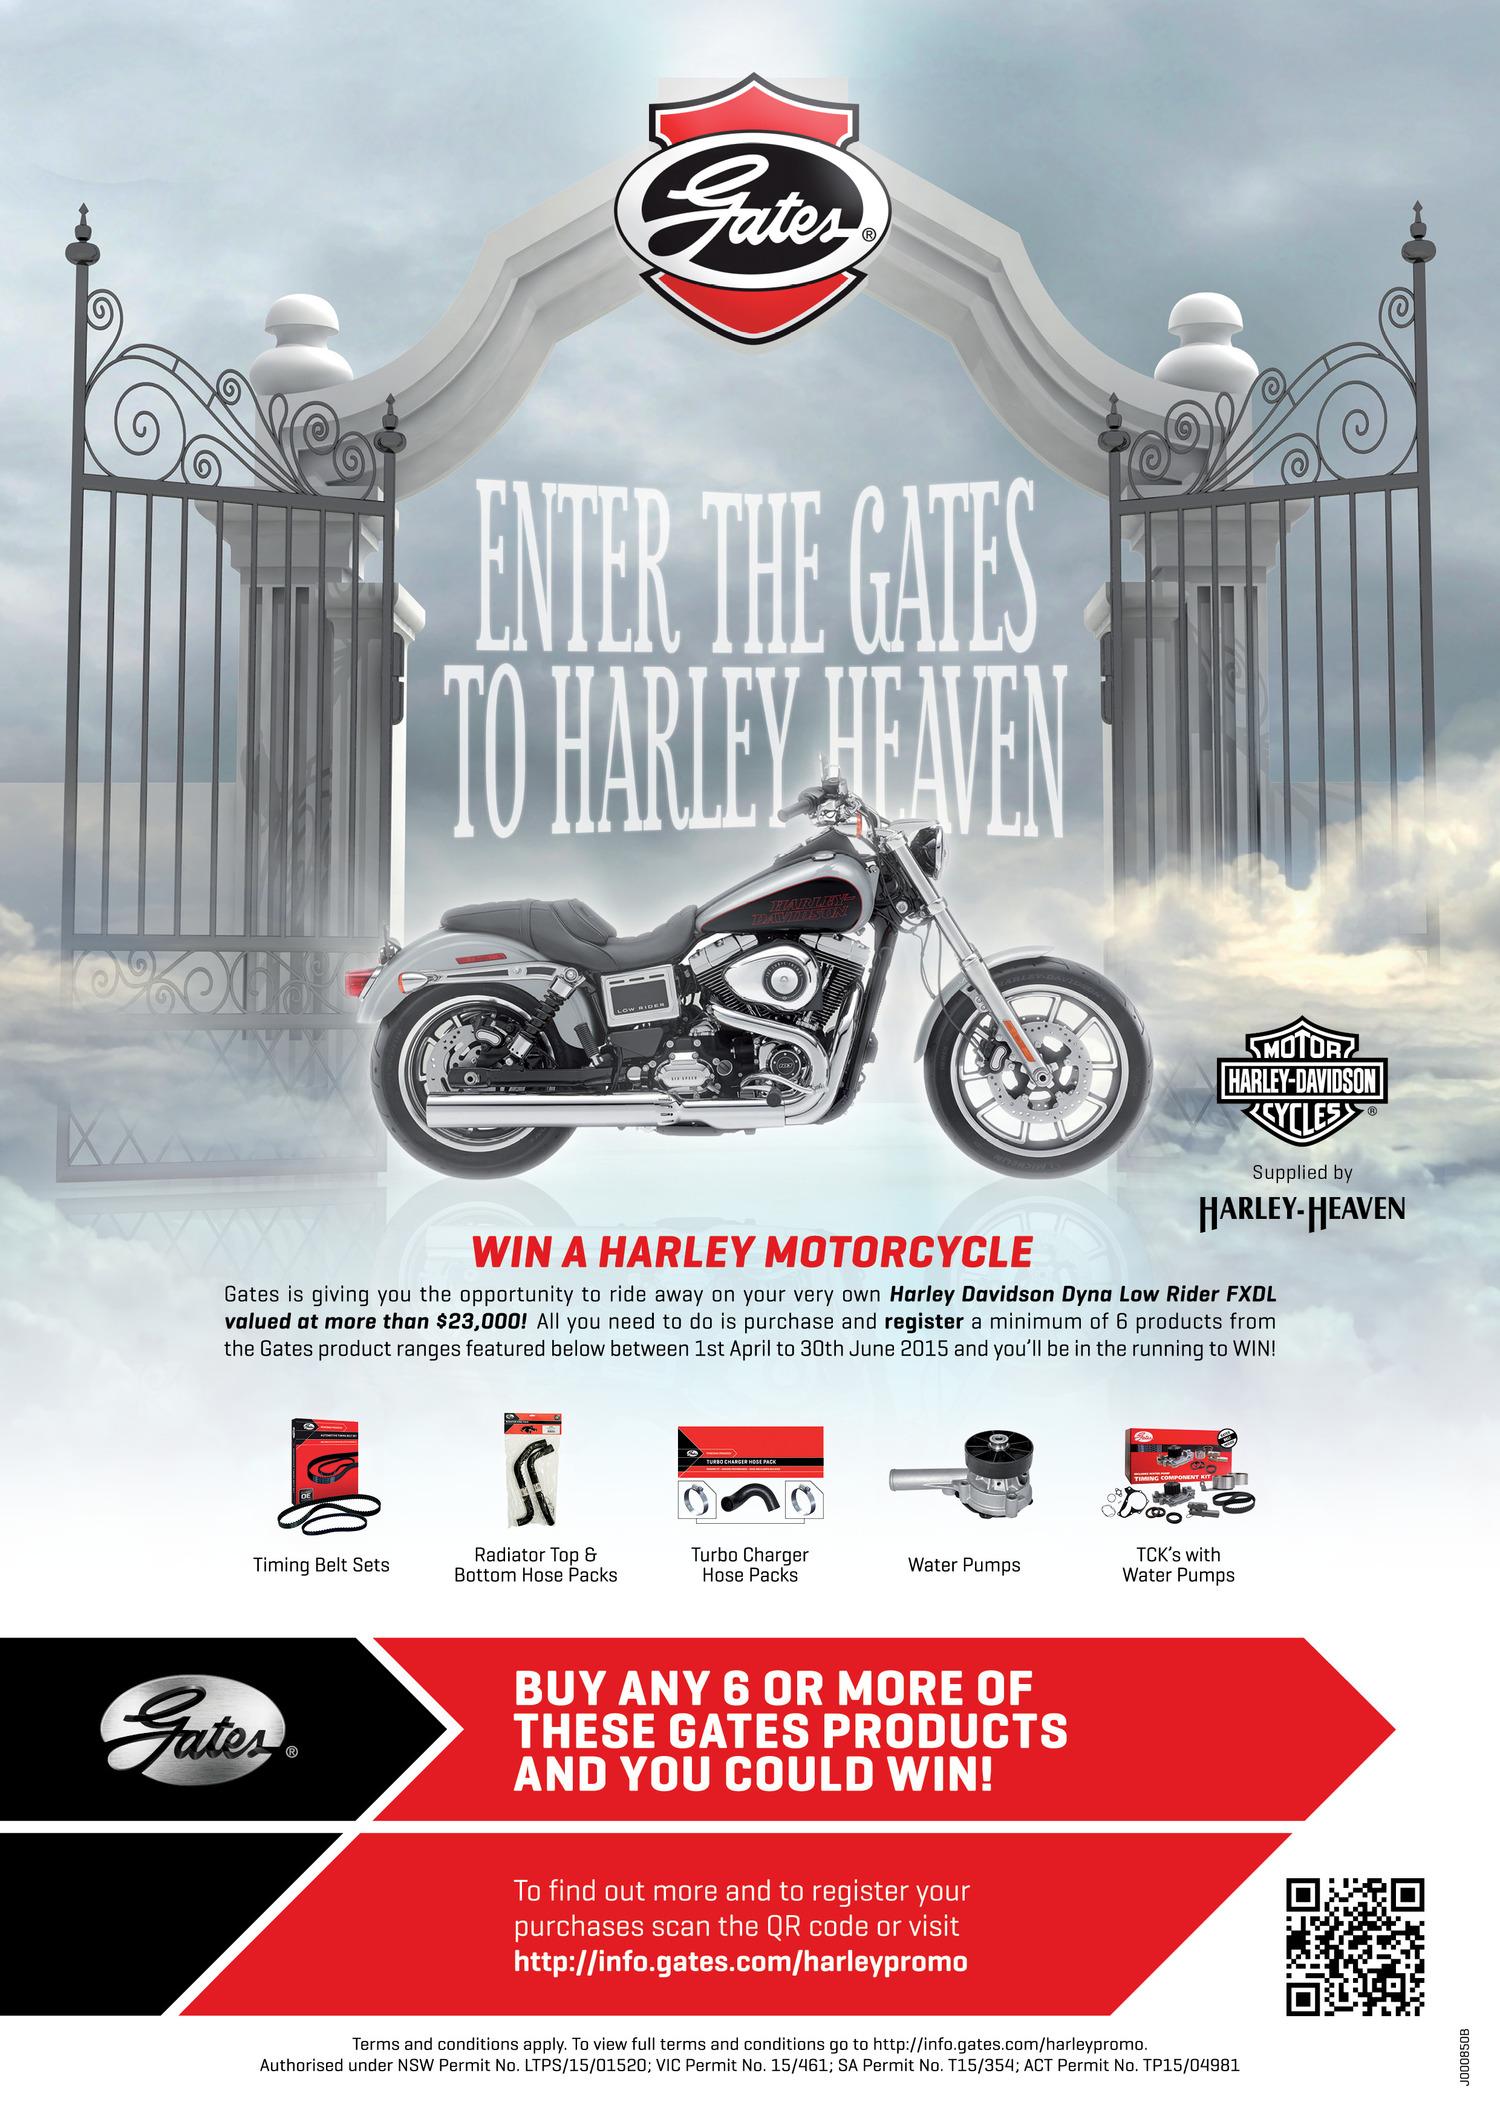 Berad Design Advertising Harley Davidson Timing Belt Gates000850 Tatmagad Harleyheaven 297x210mm Final Ol